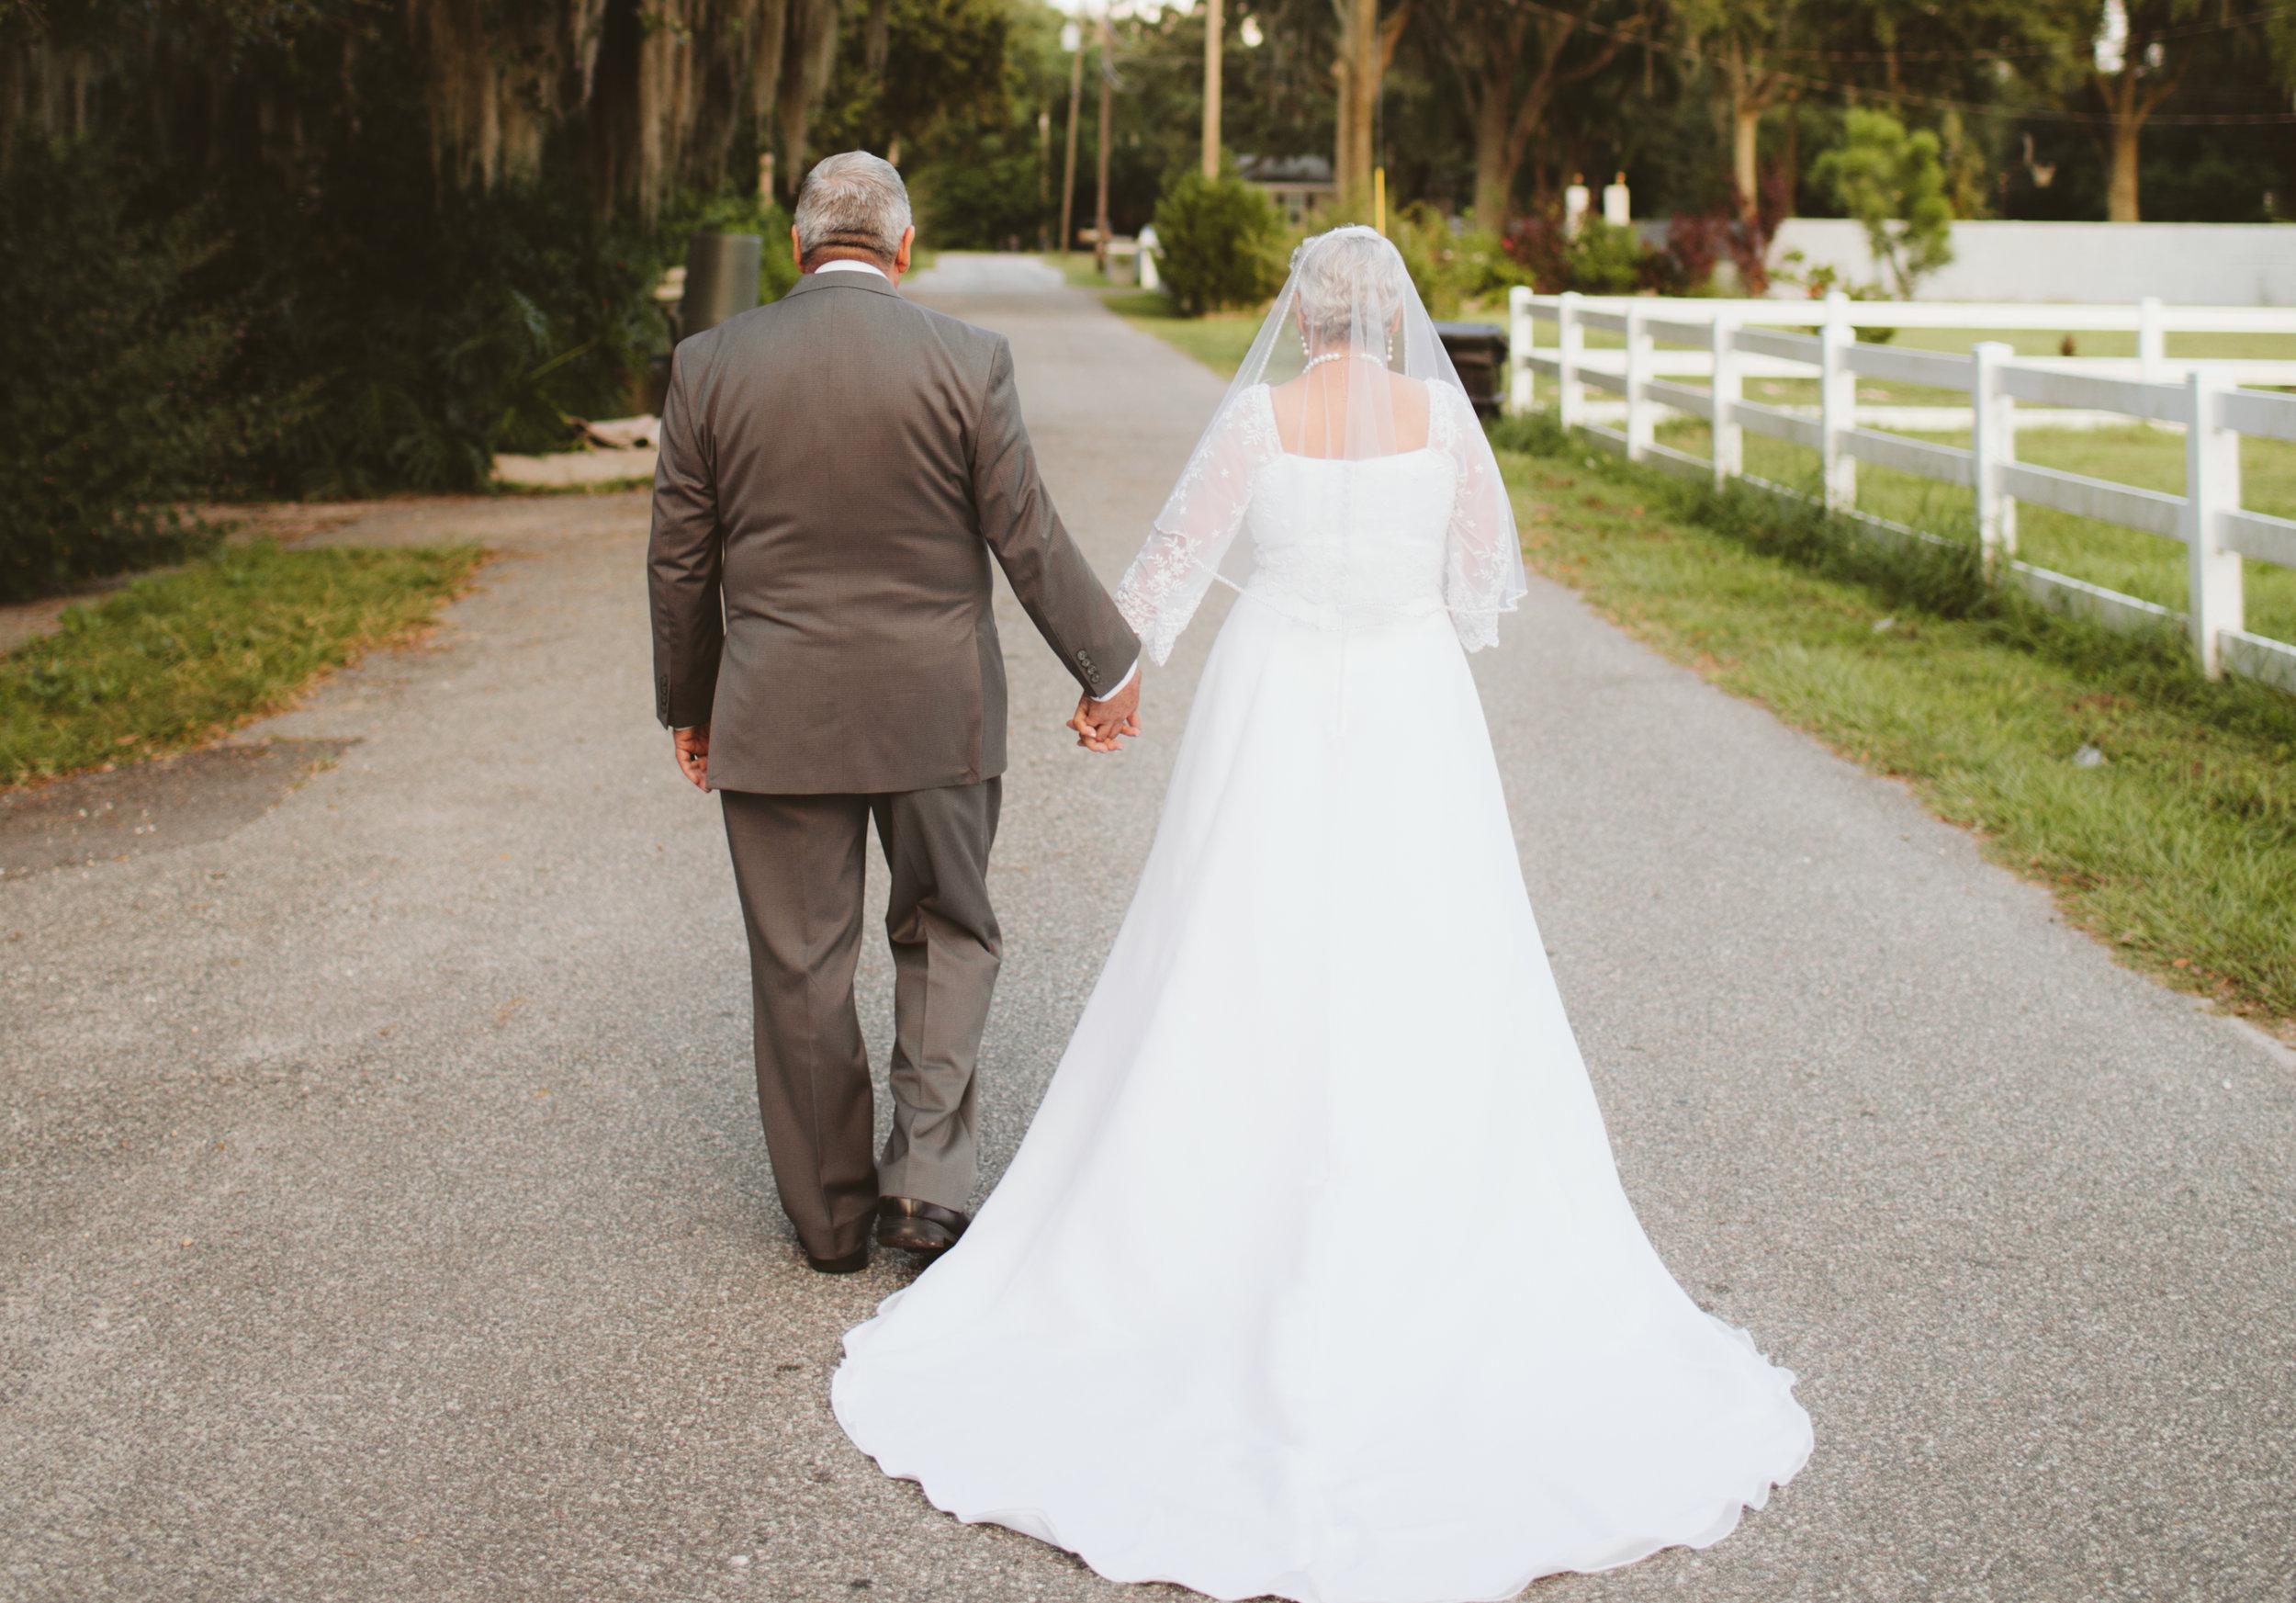 wedding | Vanessa Boy Photography | vanessaboy.com |-220.jpg